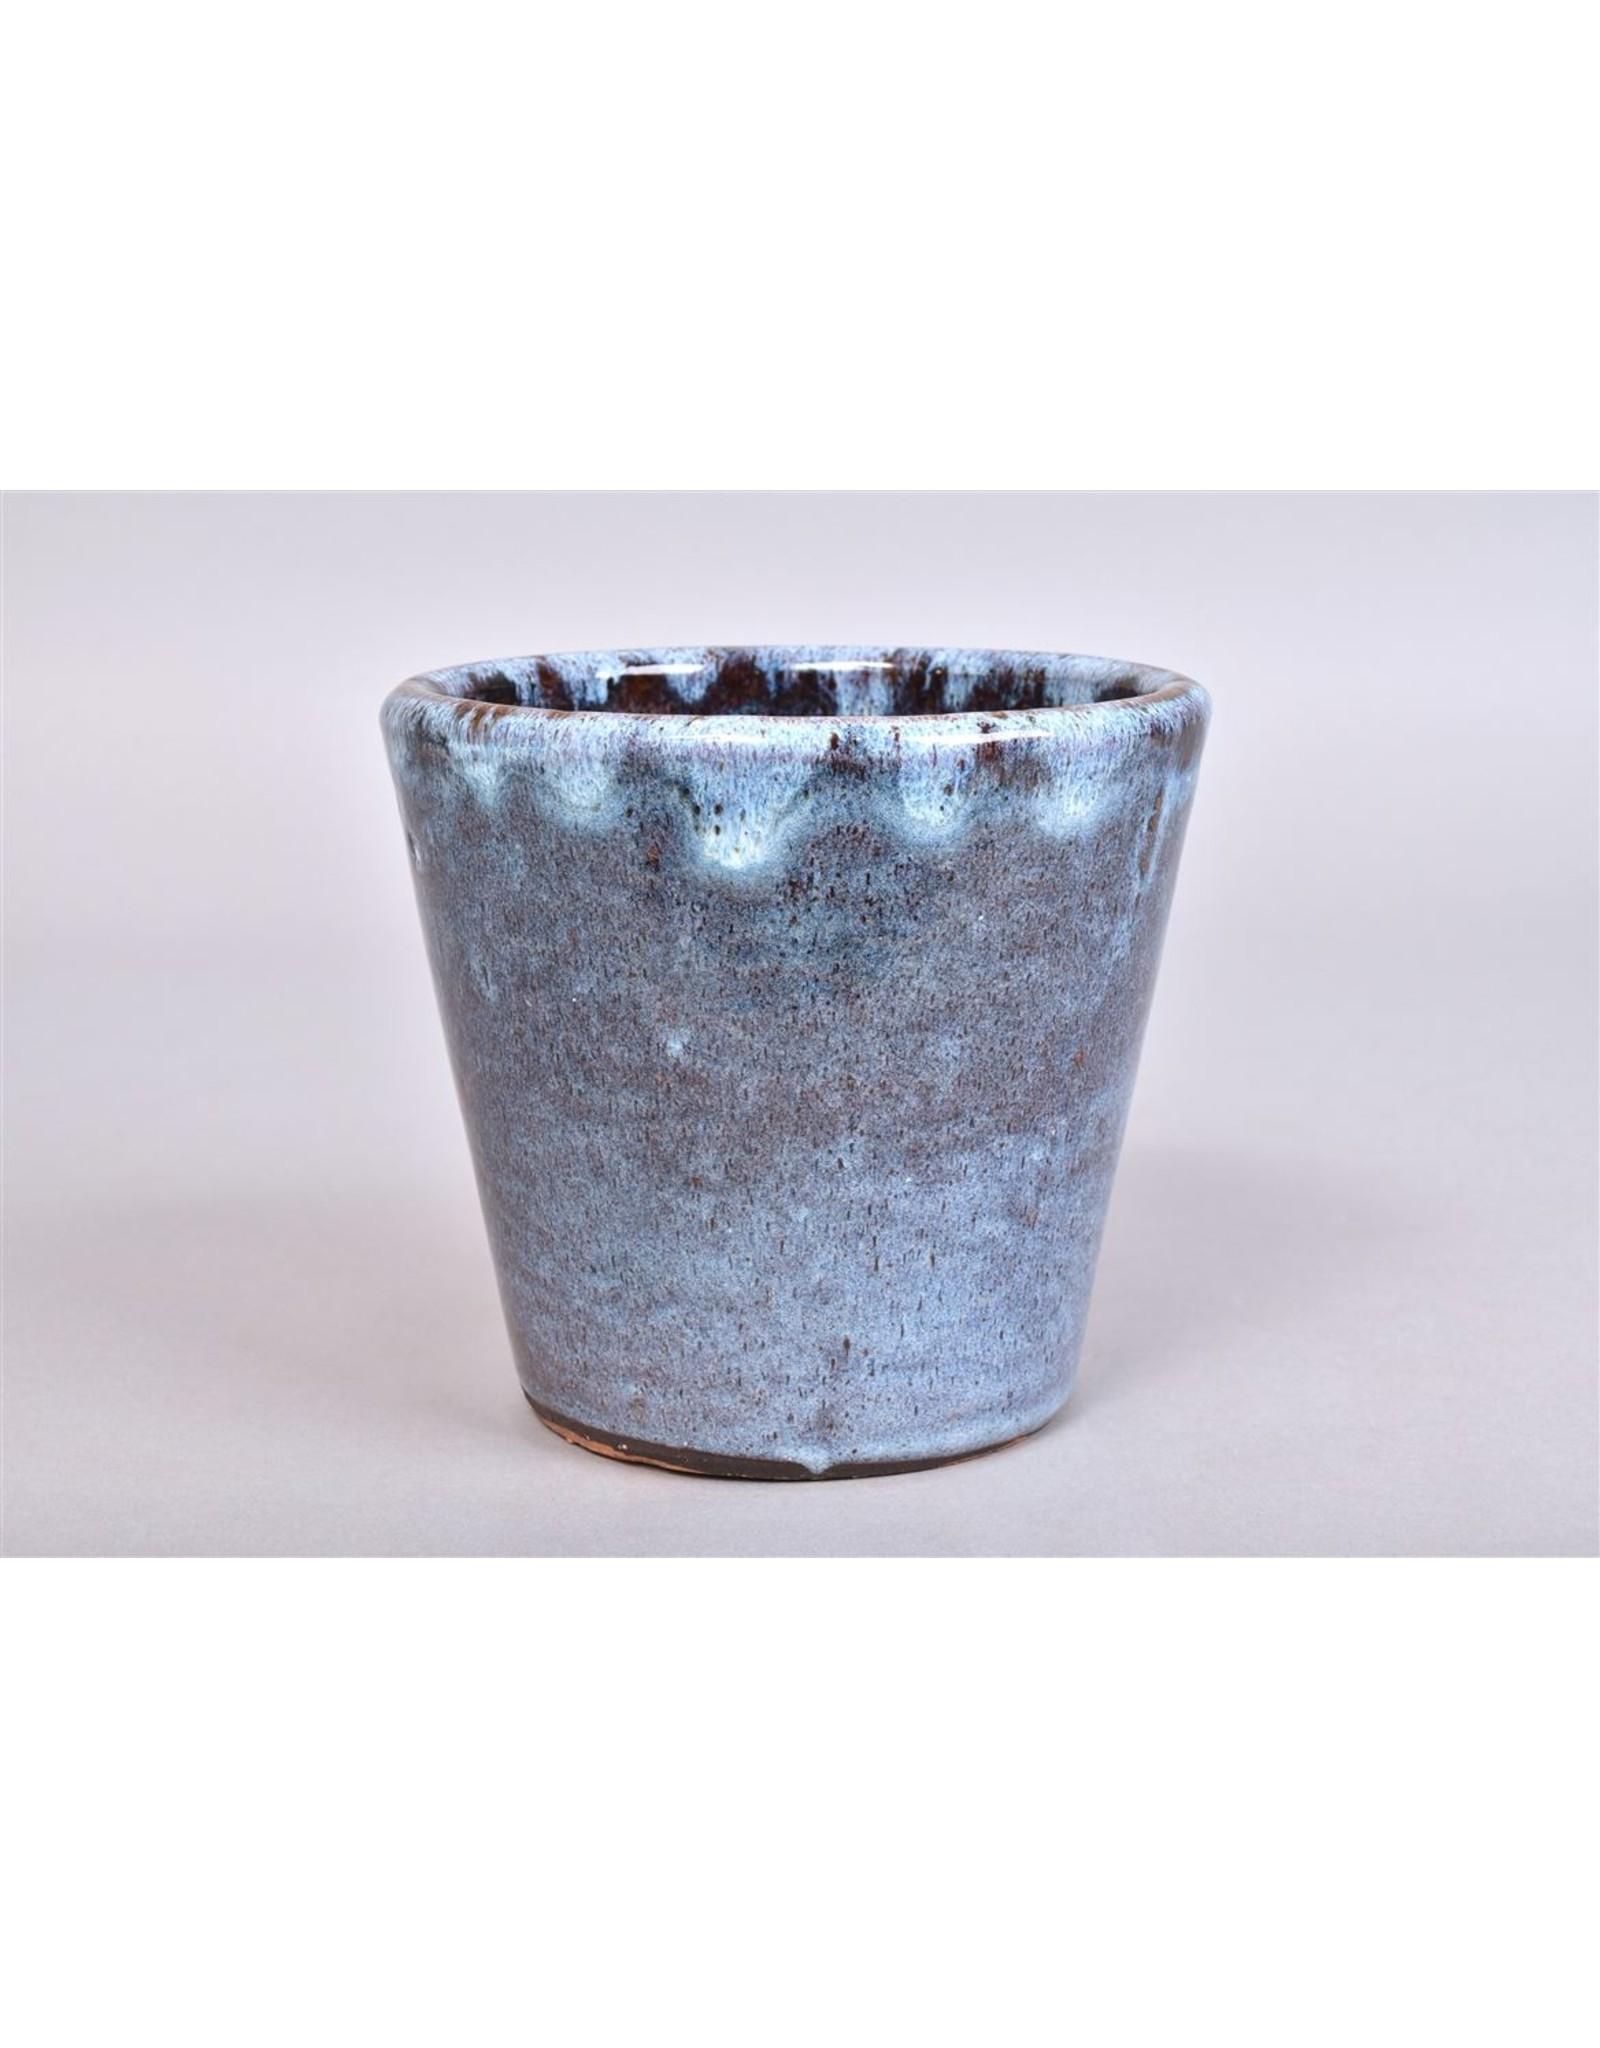 DK Alicante Lichtblauw Pot 15x14cm x 2